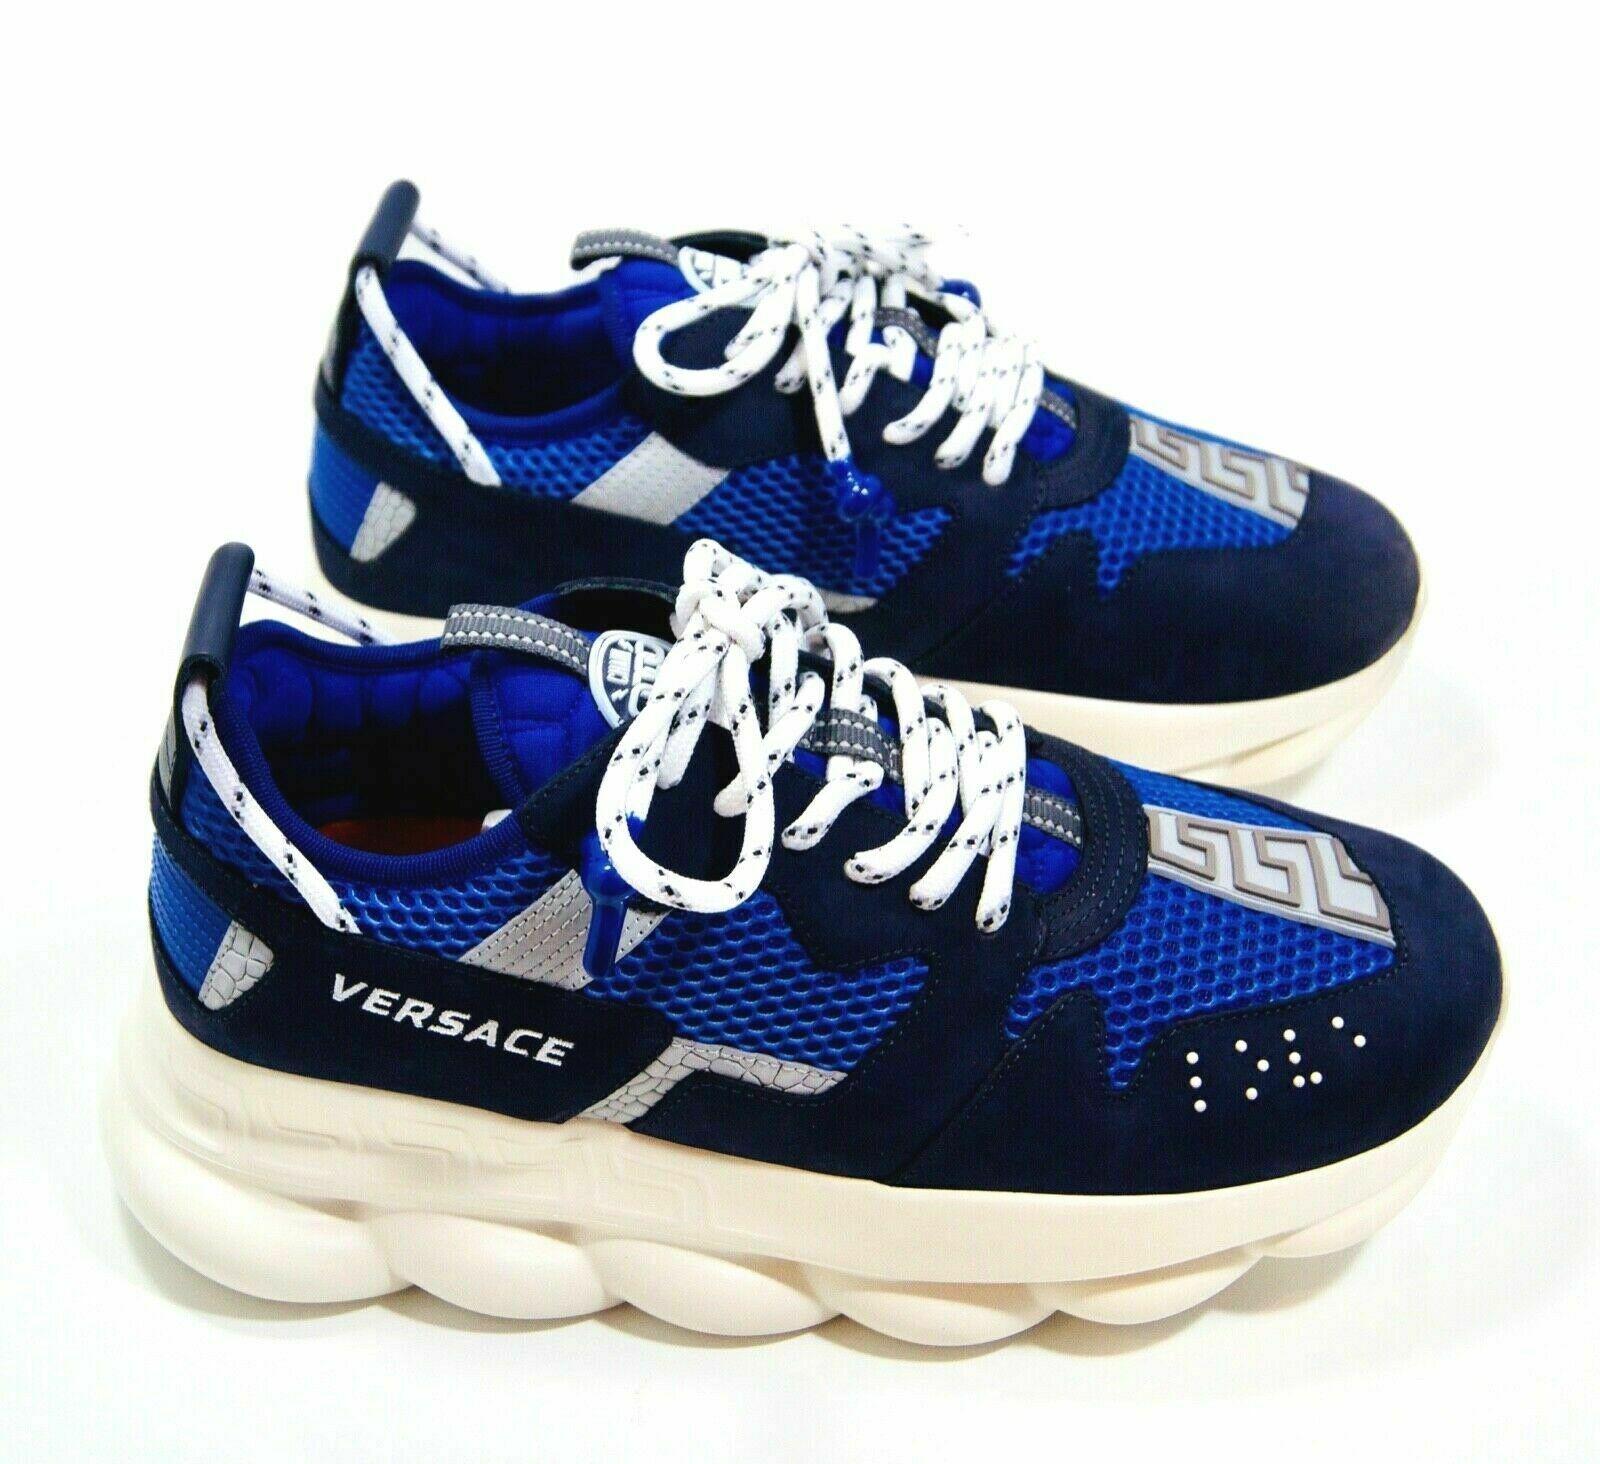 Versace Chain Reaction Blue